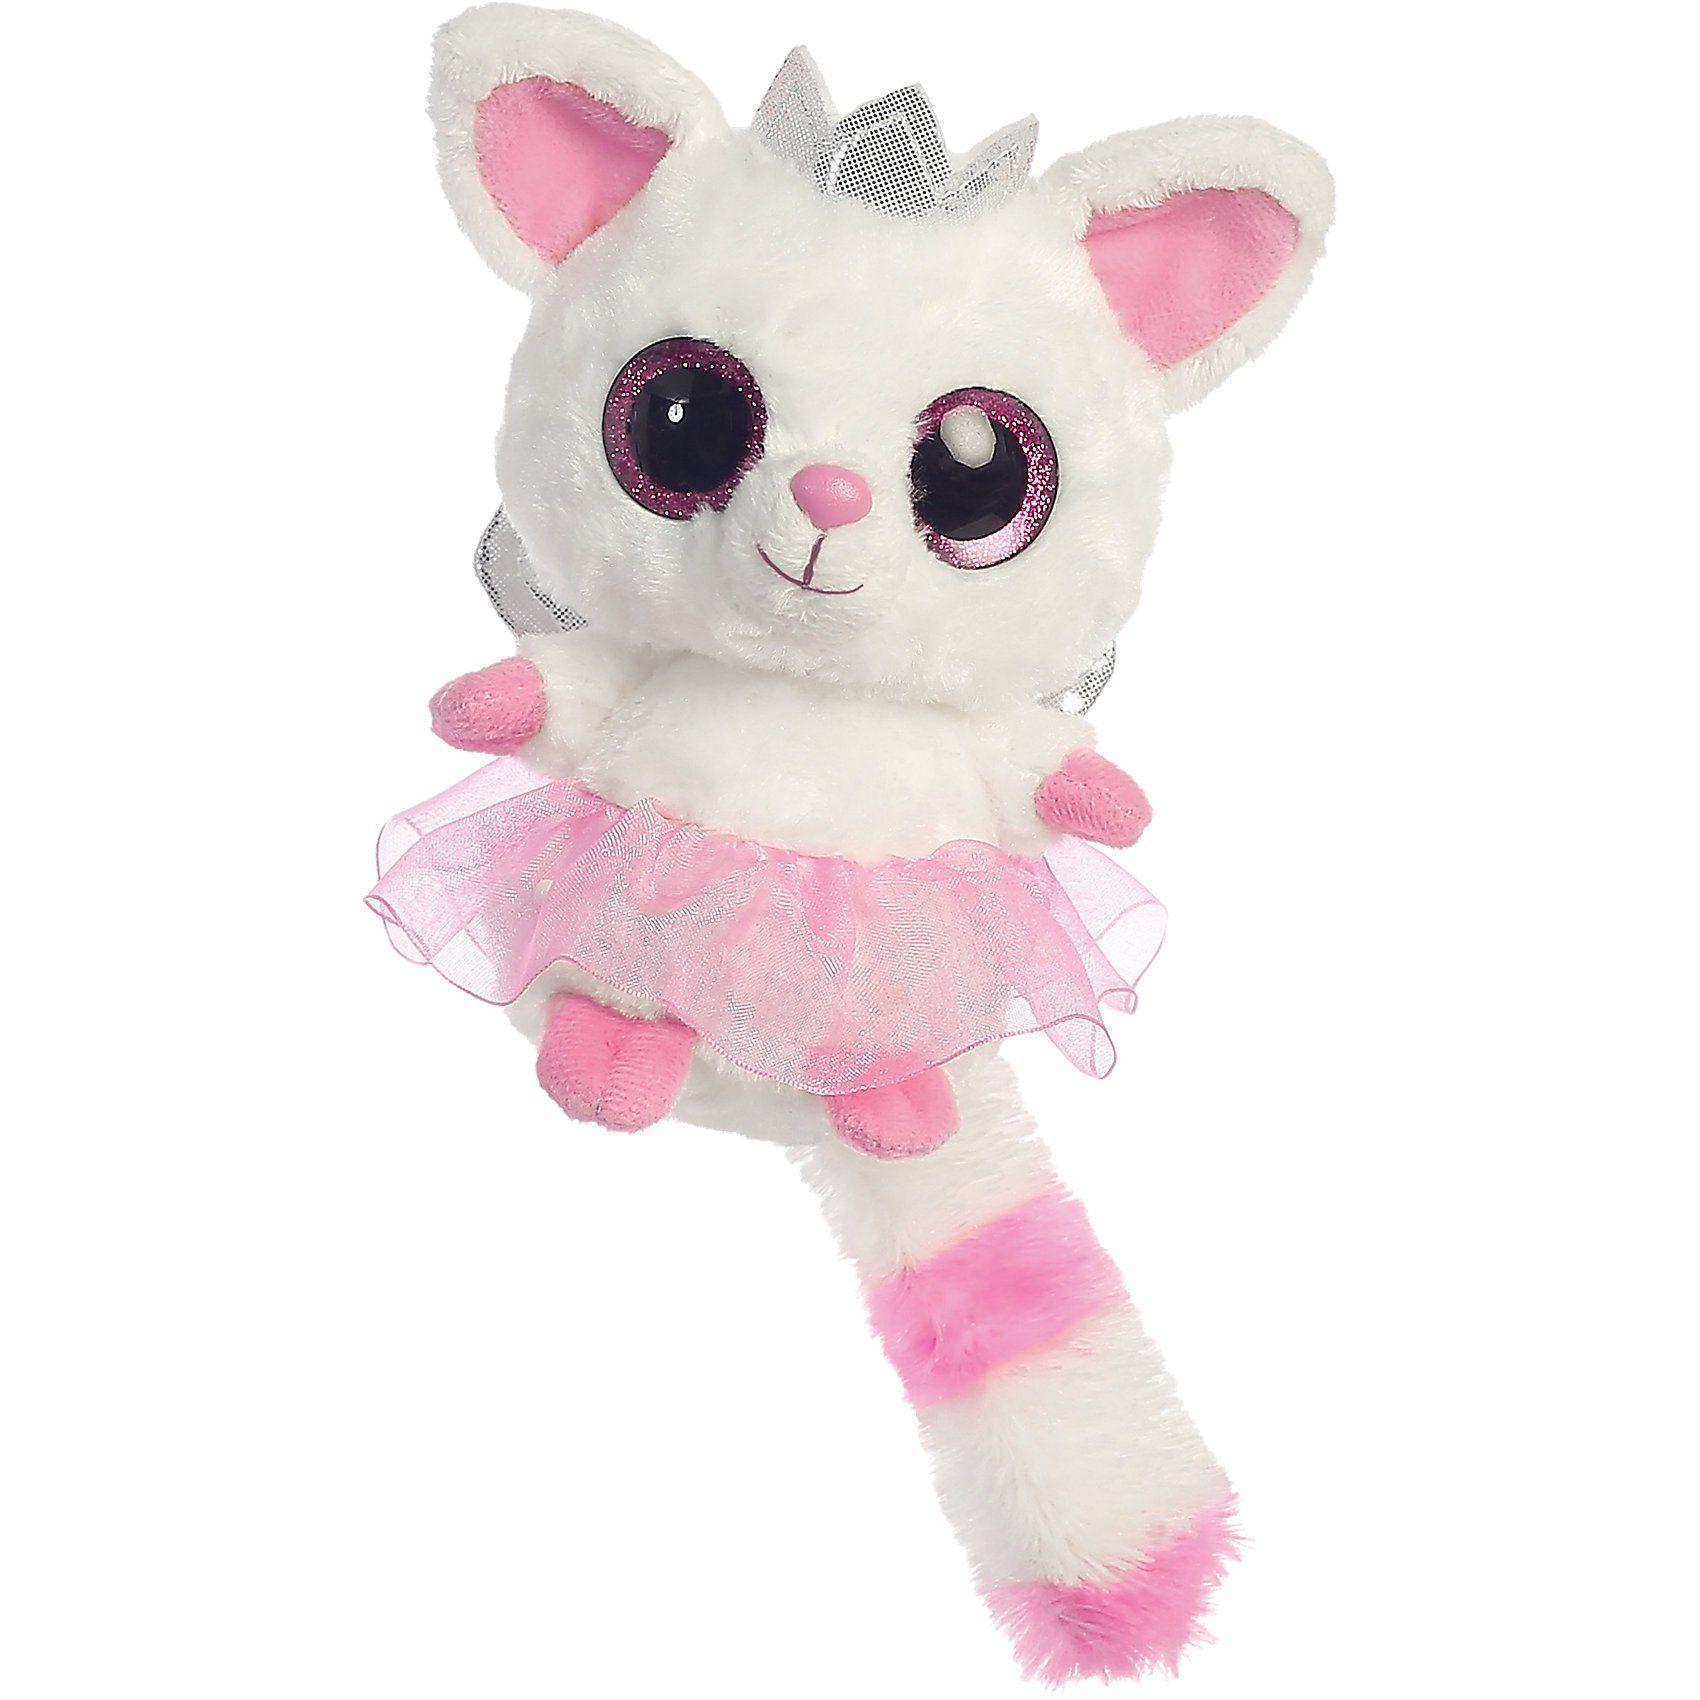 Yoohoo Pammee Fairy Princess 20cm